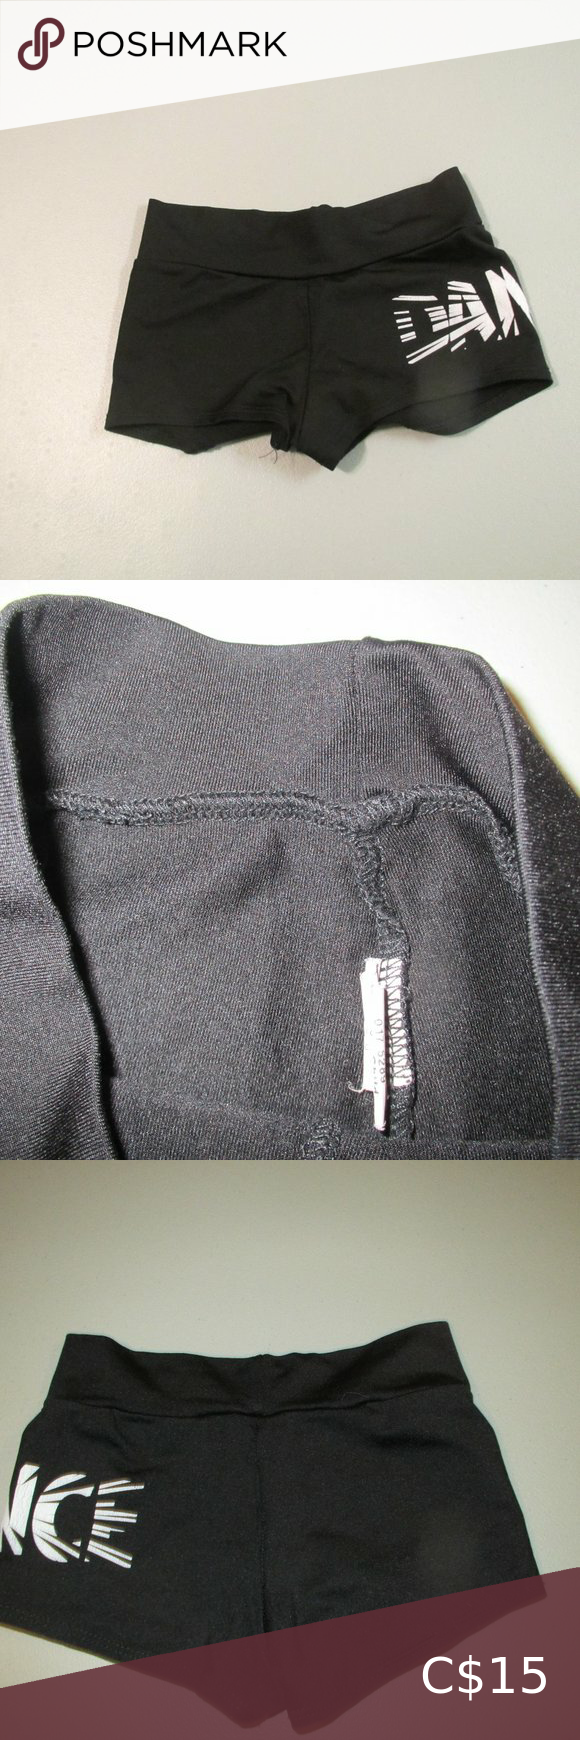 Black Motion Wear Dance Shorts Size 12-14